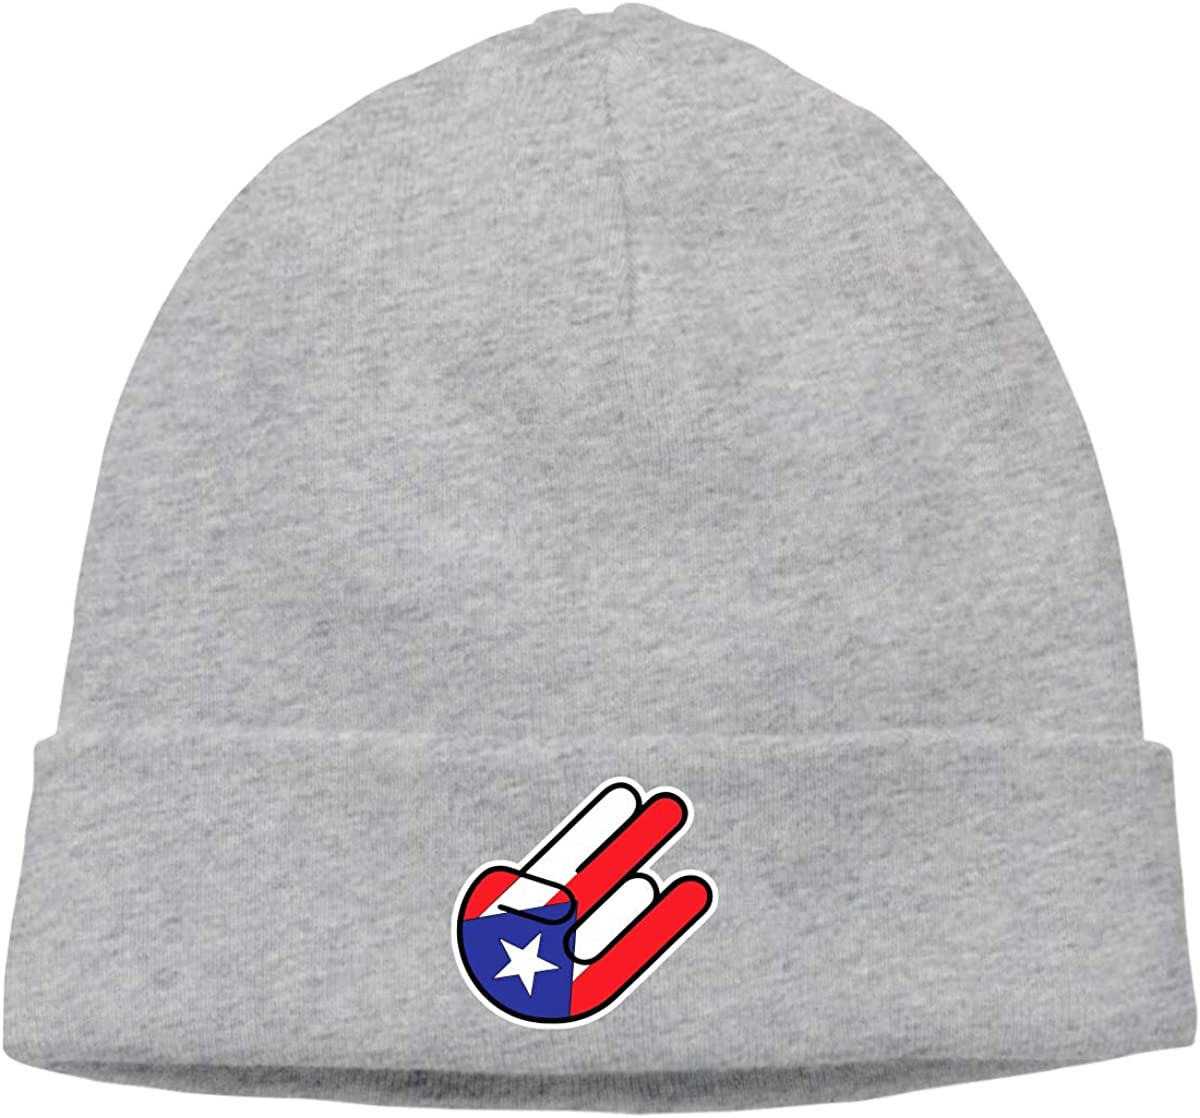 BBlooobow Unisex Pureto Rican Flag Flag Soft Knit Beanie Caps